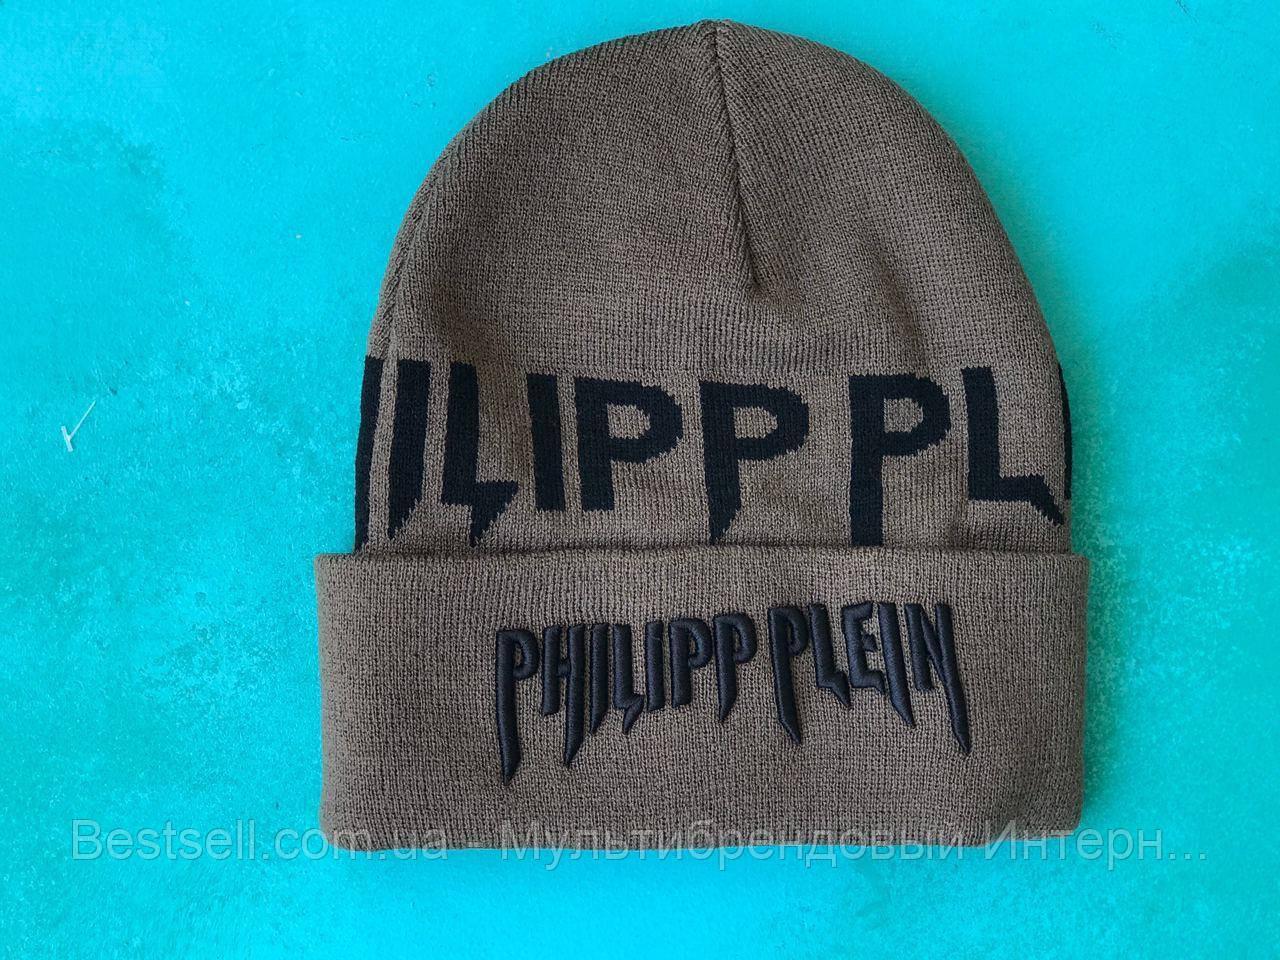 Шапка Philipp Plein / шапка філіп преин / шапка жіноча/шапка чоловіча/хакі